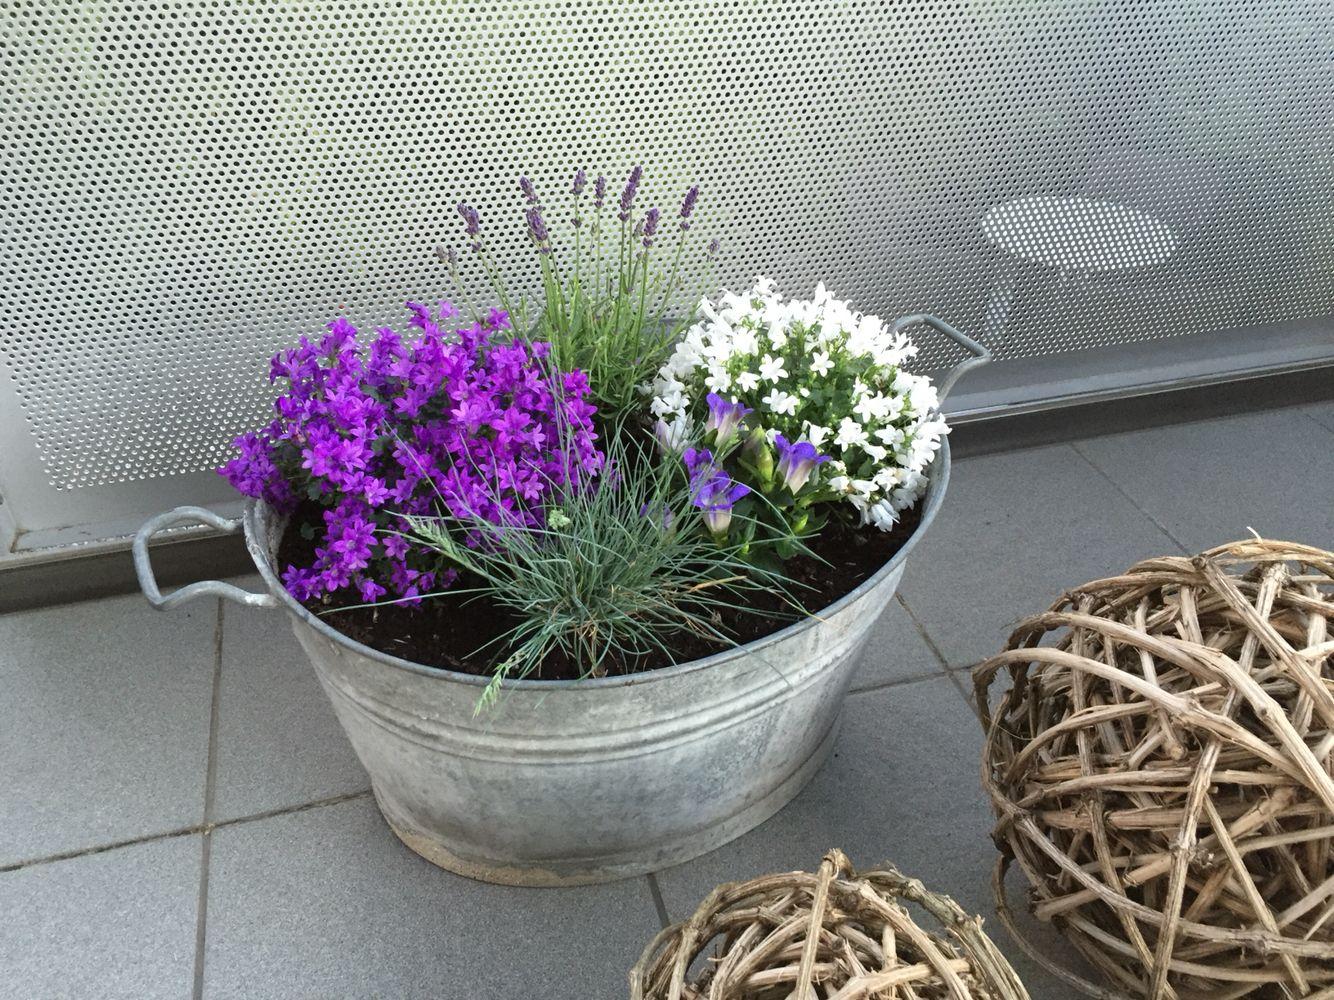 sommer bepflanzung balkon balkon und hauseingang ideen blumenkasten balkon. Black Bedroom Furniture Sets. Home Design Ideas